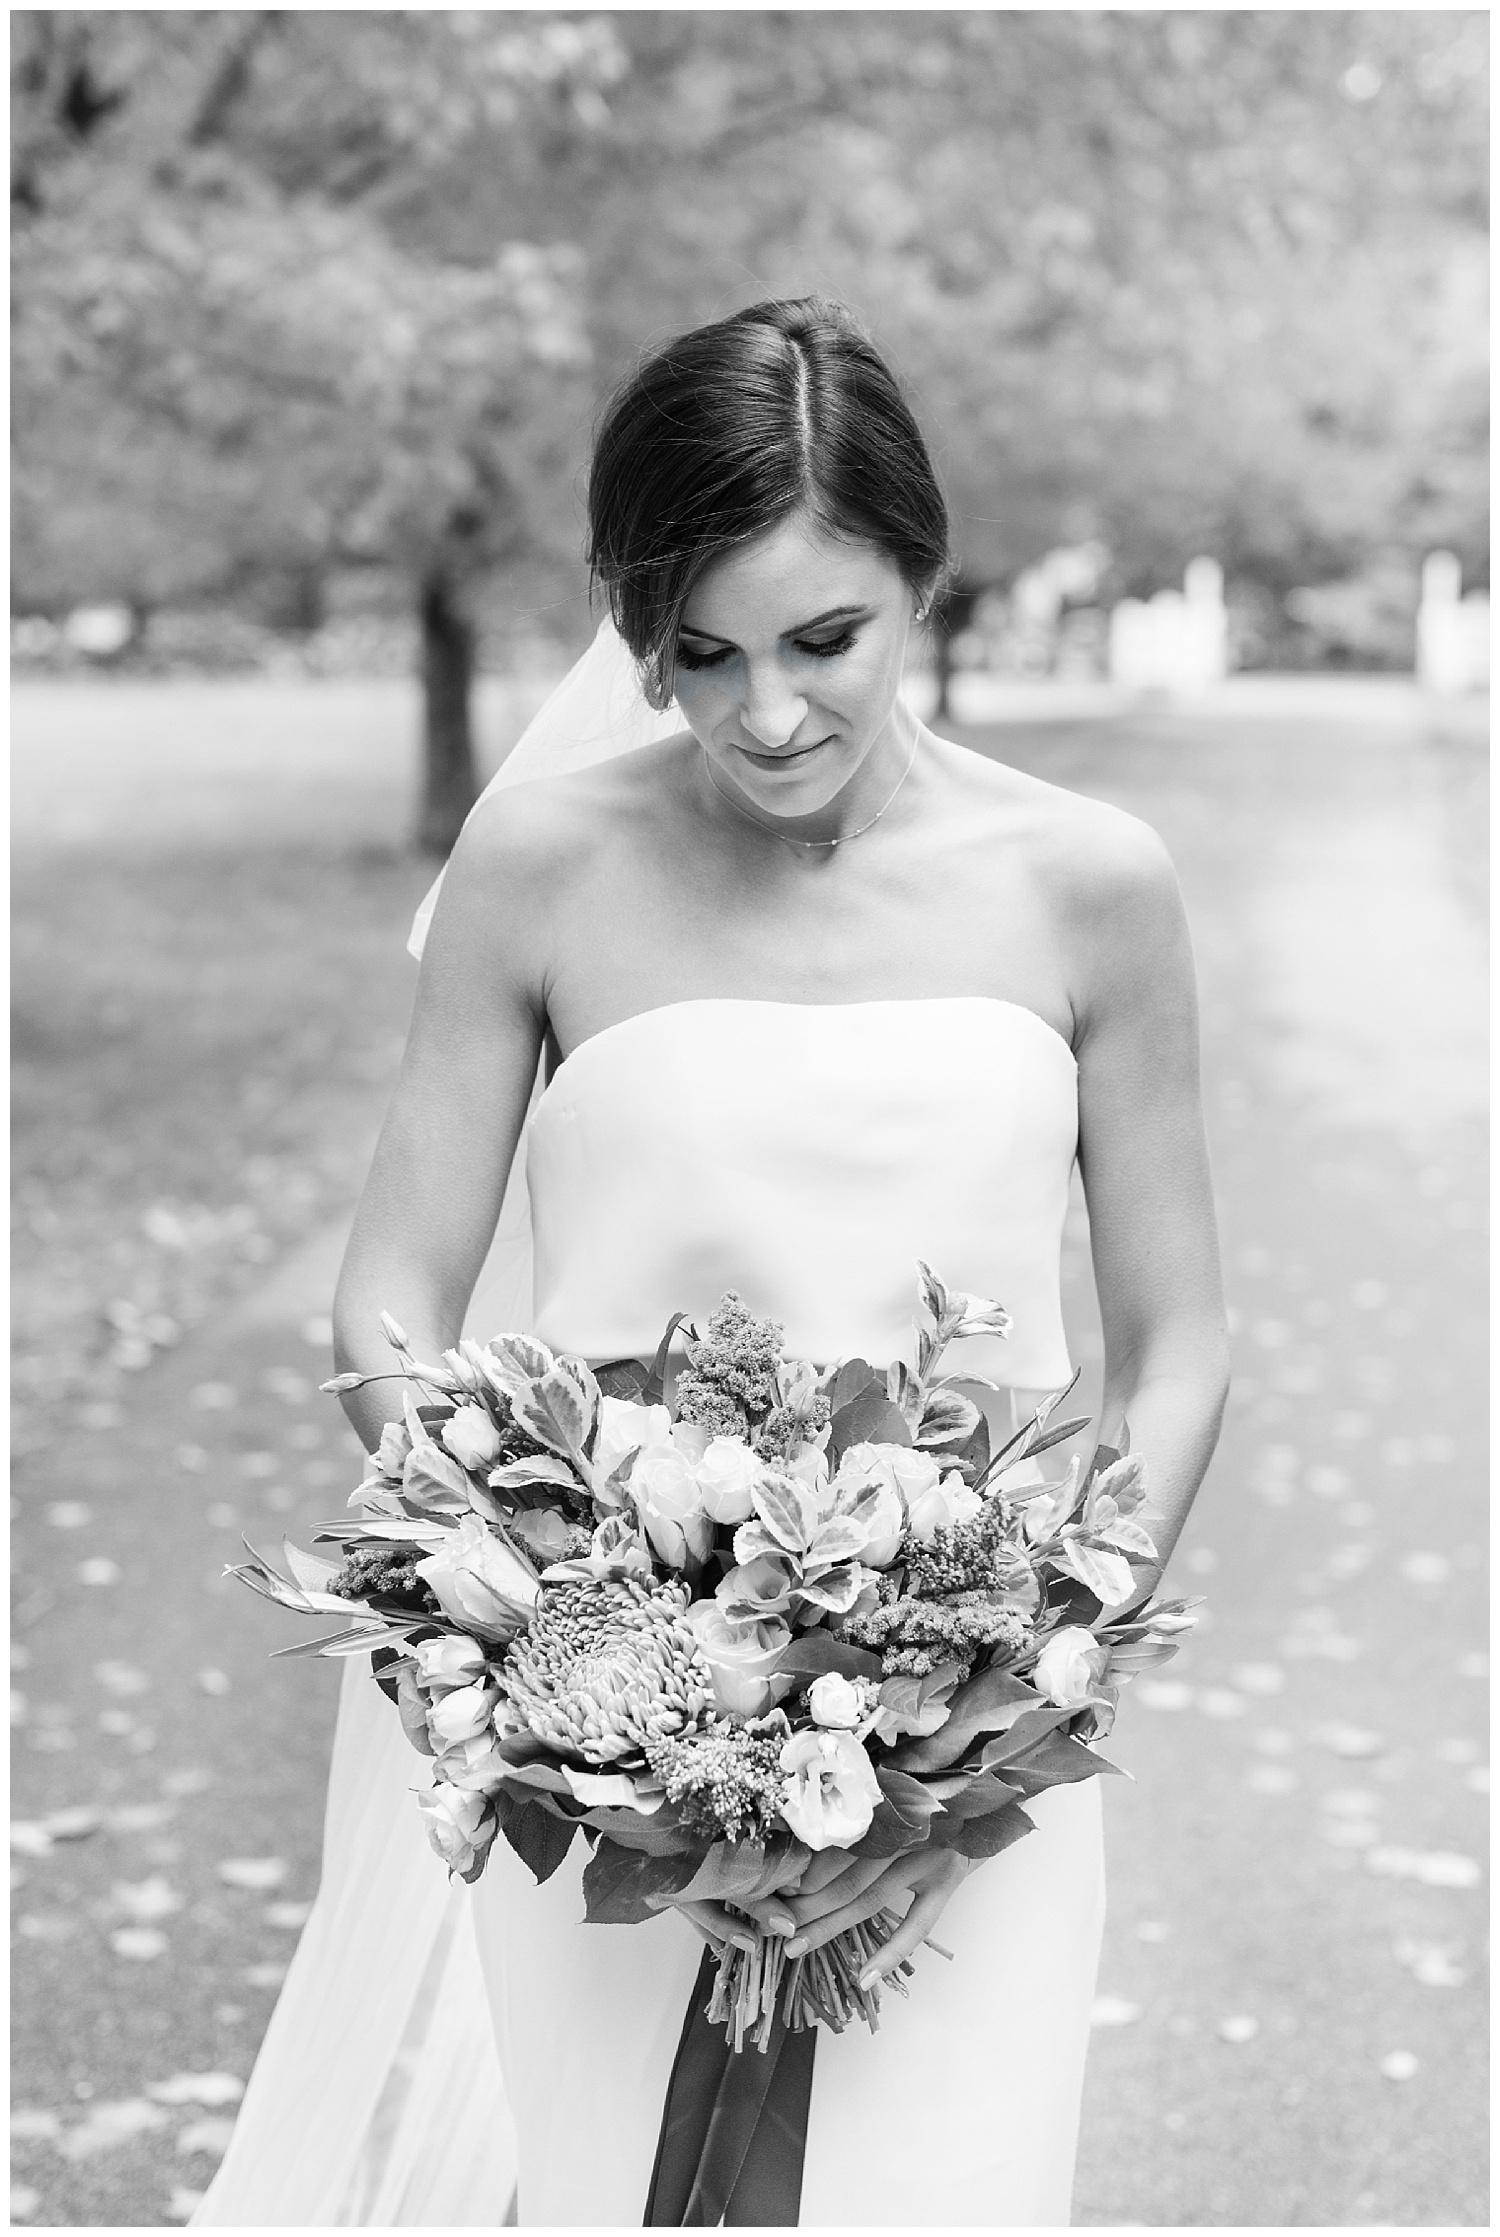 pompositticut-farm-fall-wedding-photography-hudson-massachusetts-photo-12.jpg